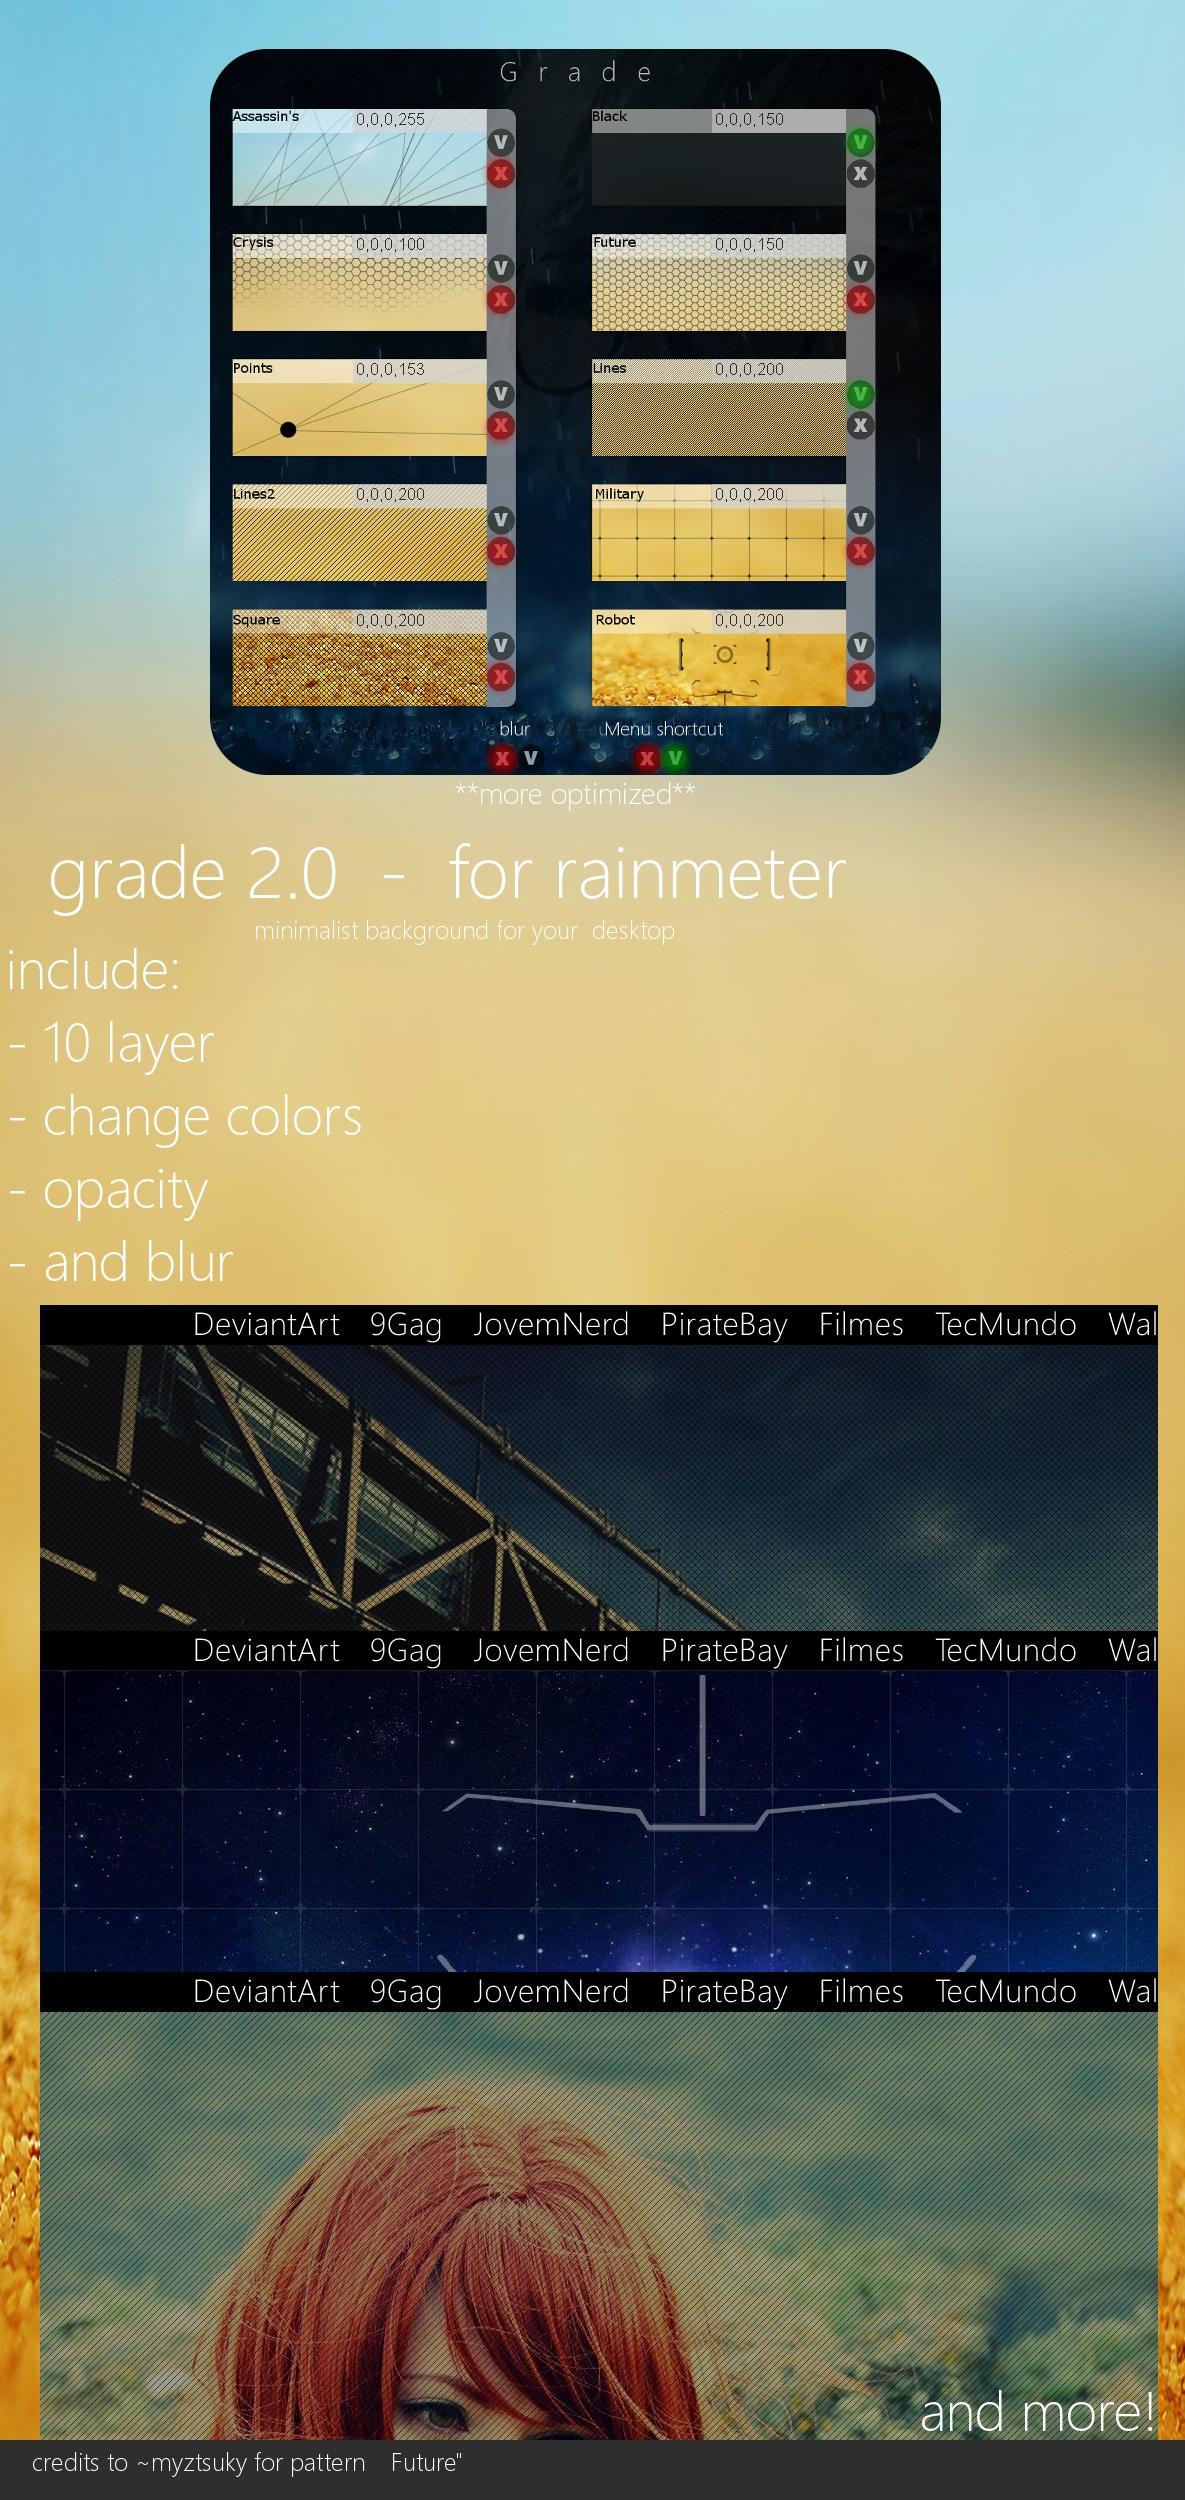 Grade 2.0  for Rainmeter by Pedro9666